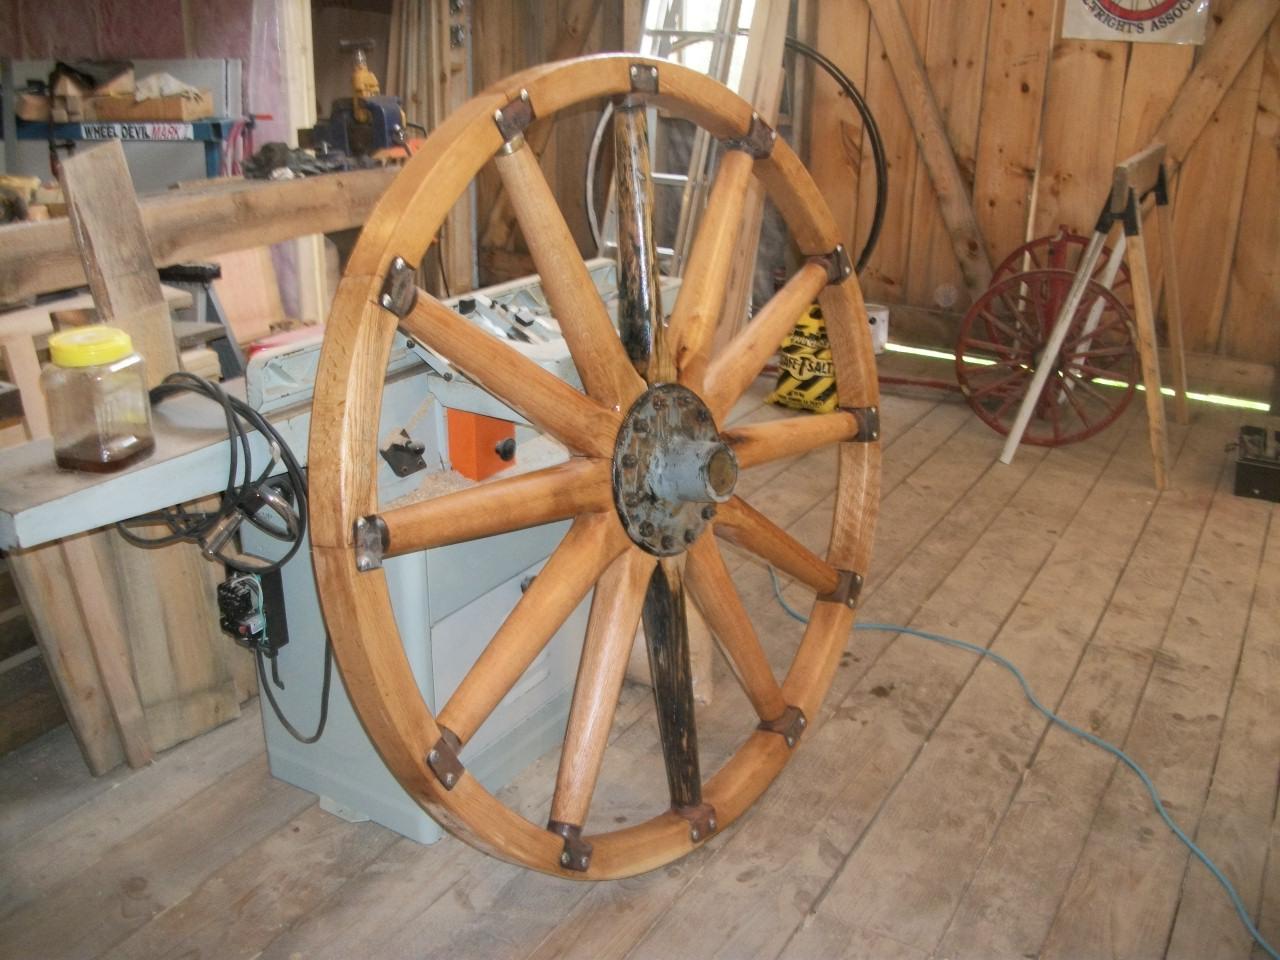 Sampson on cannon wheel 012.JPG